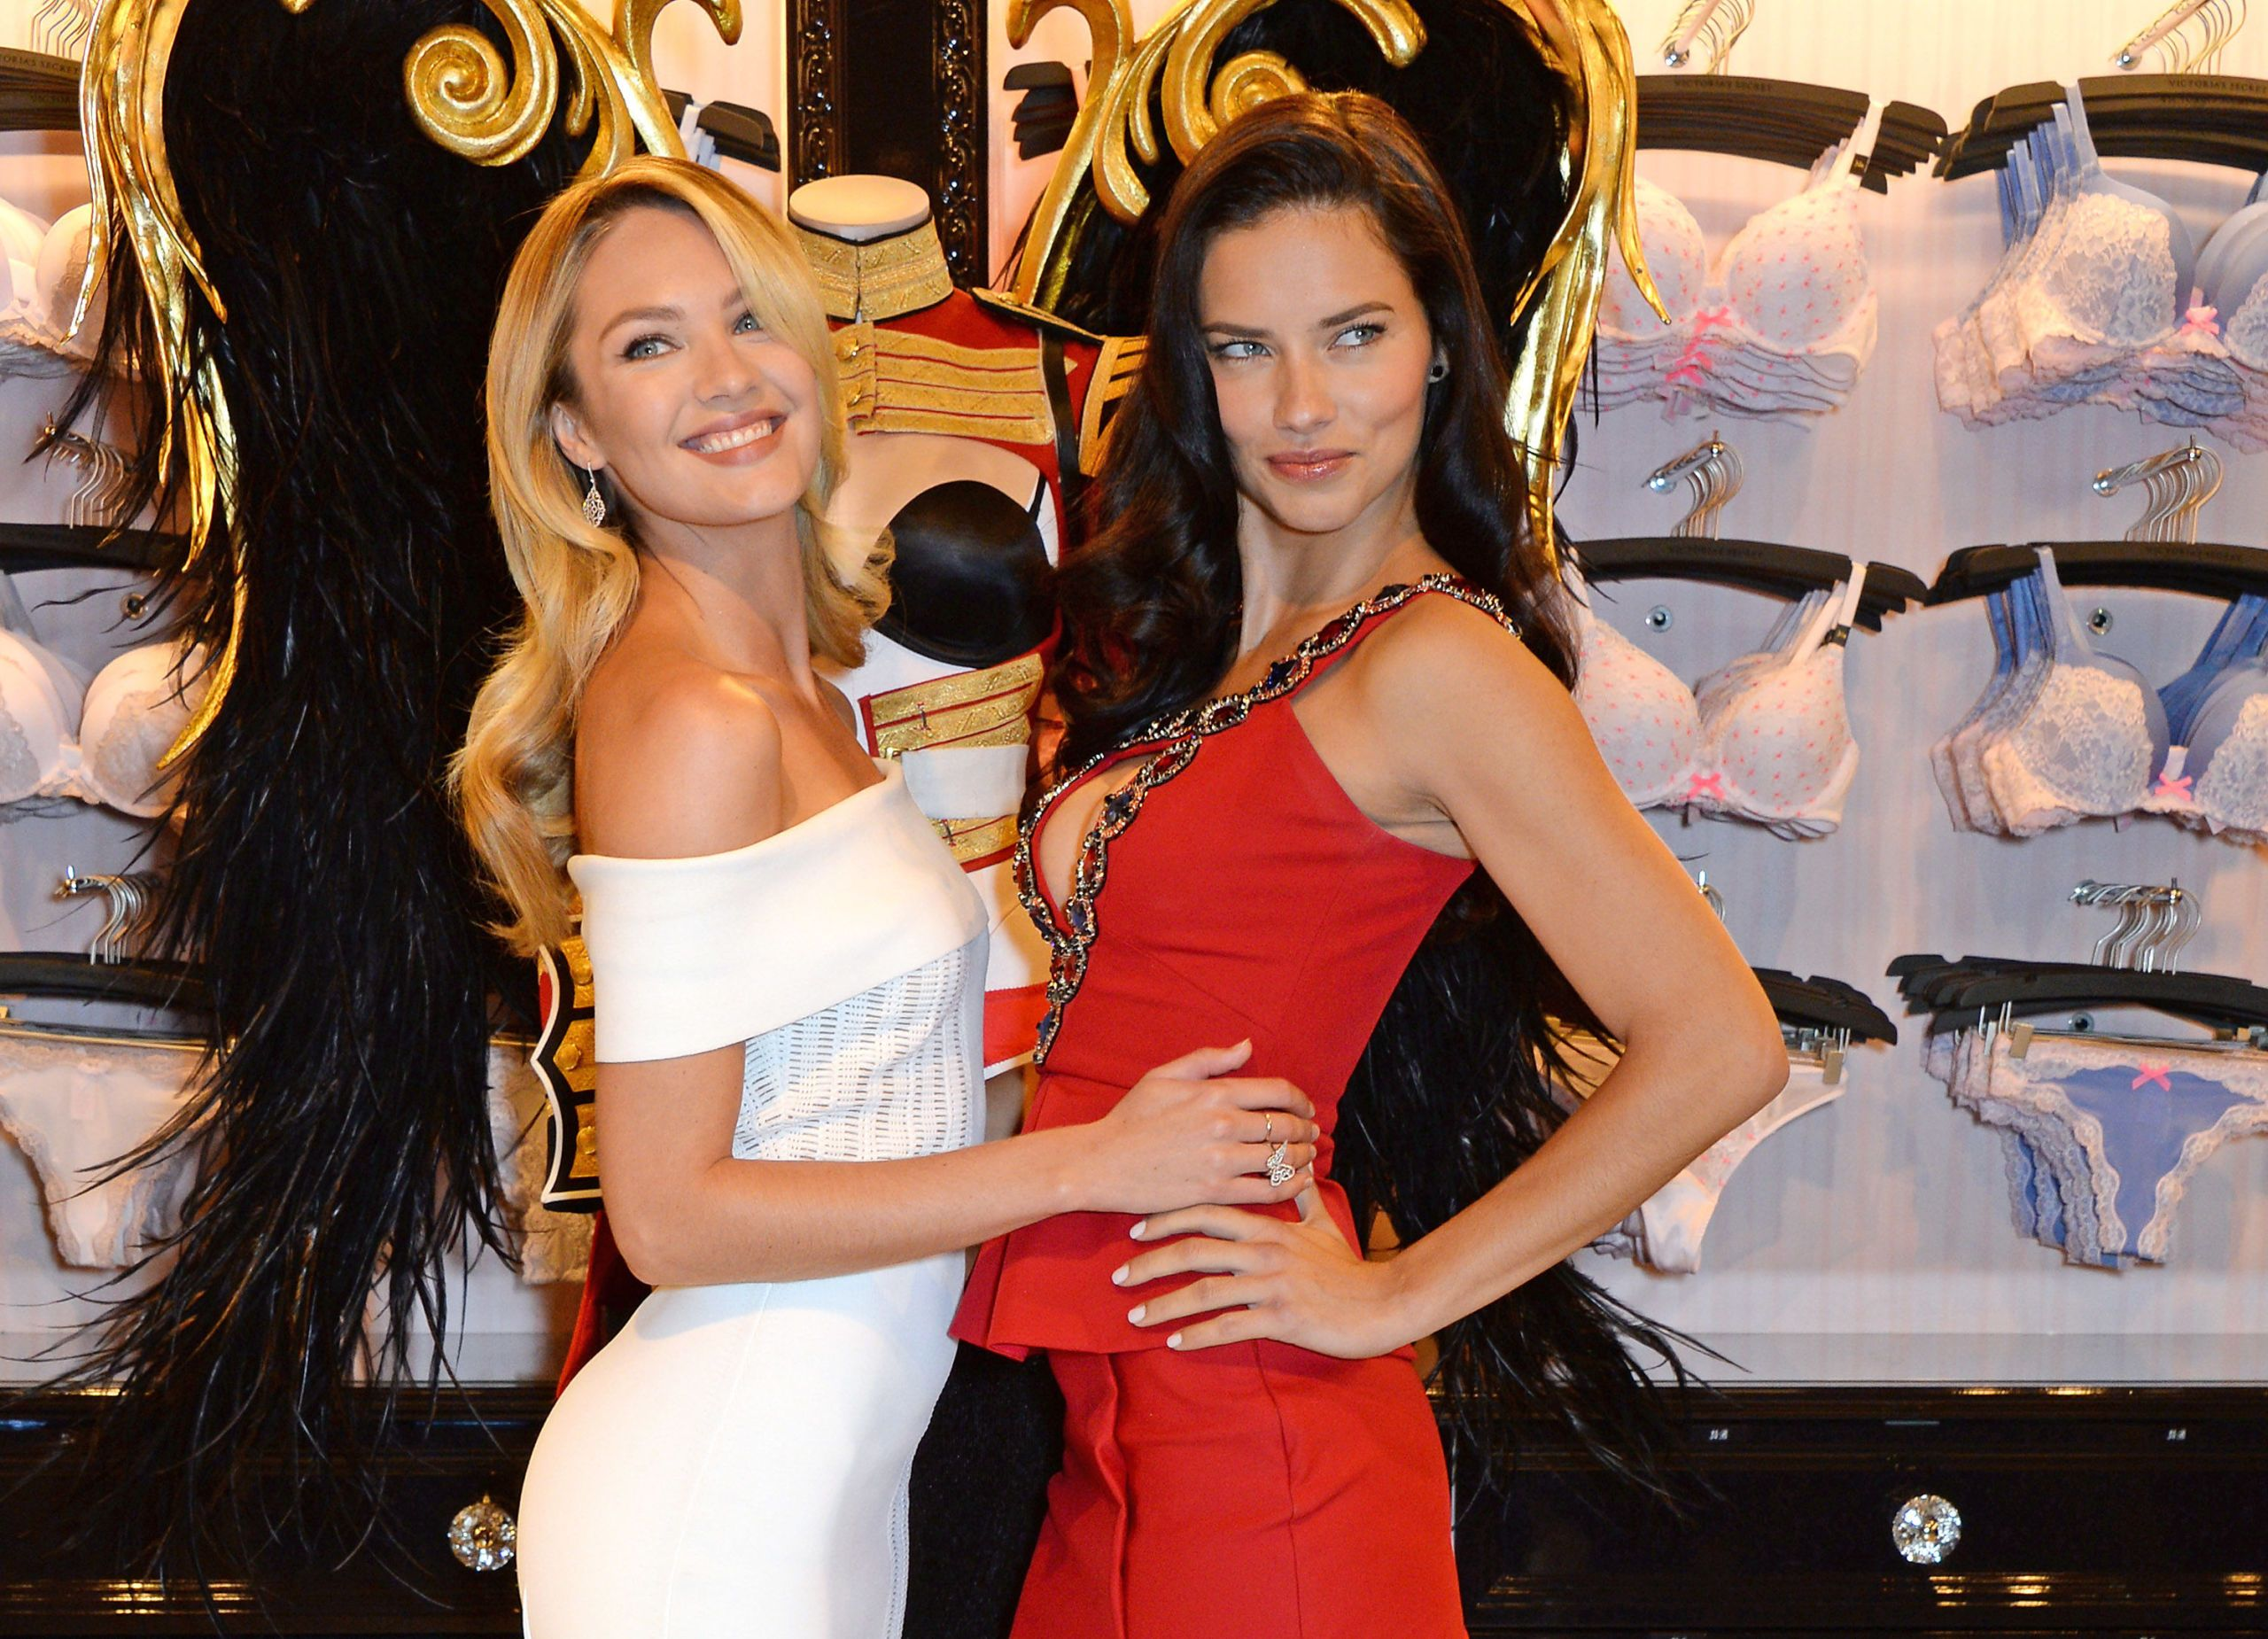 Victorias secret new angels 2018 giveaways